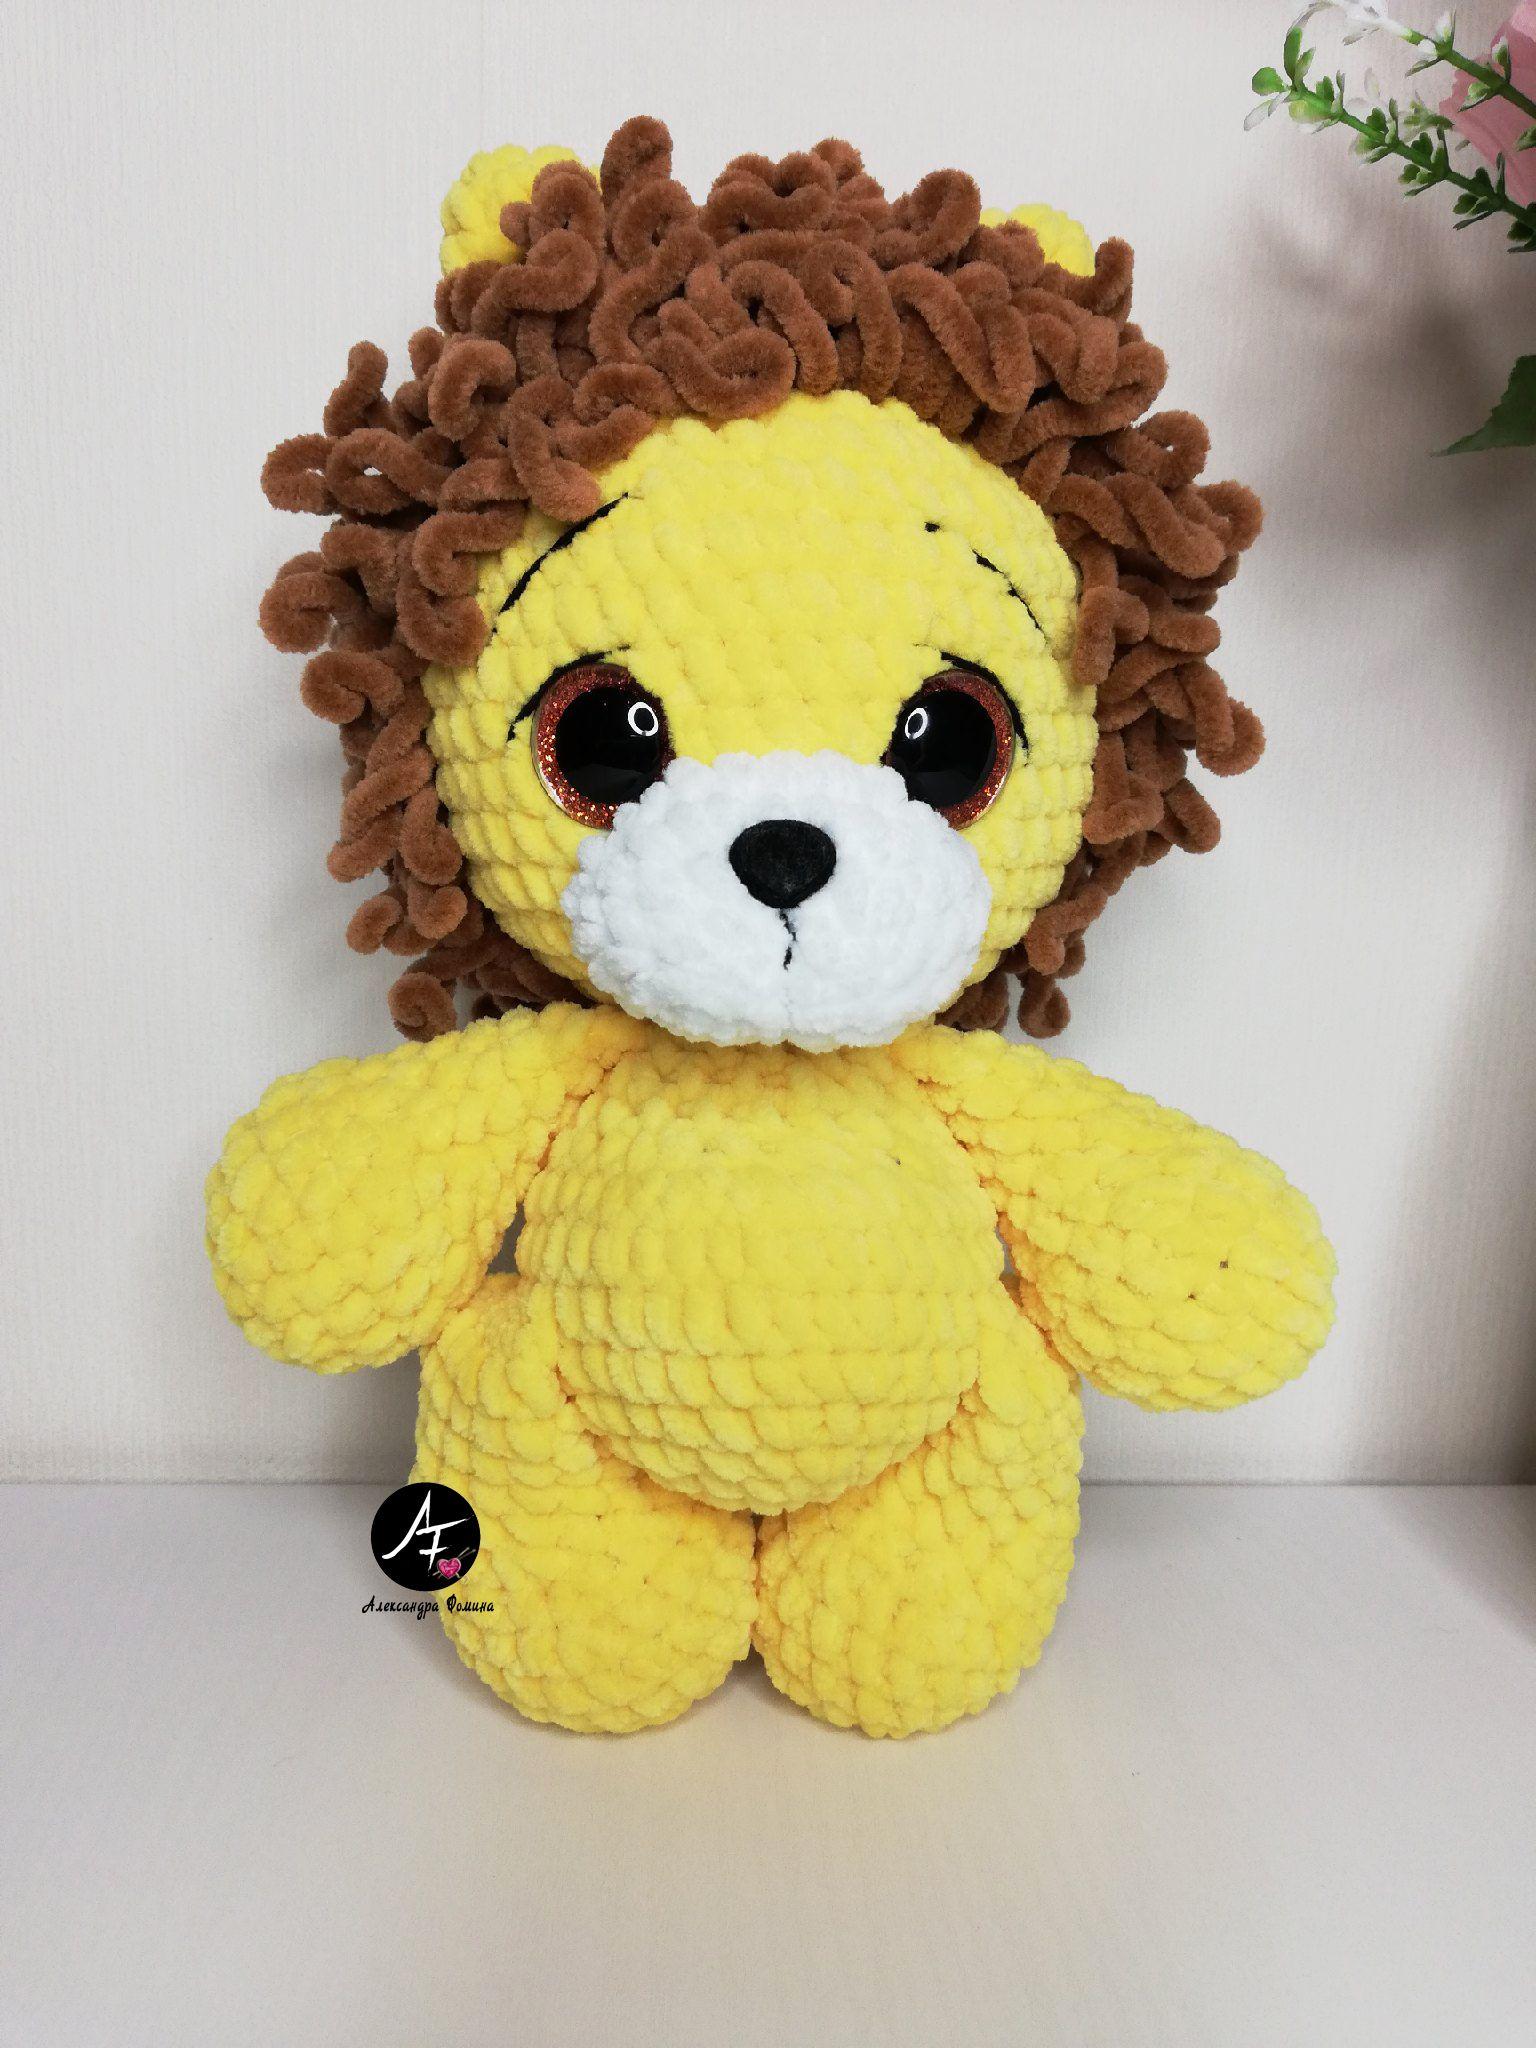 Crocheted plush toys bigeyed lion, best amigurumi stuffed